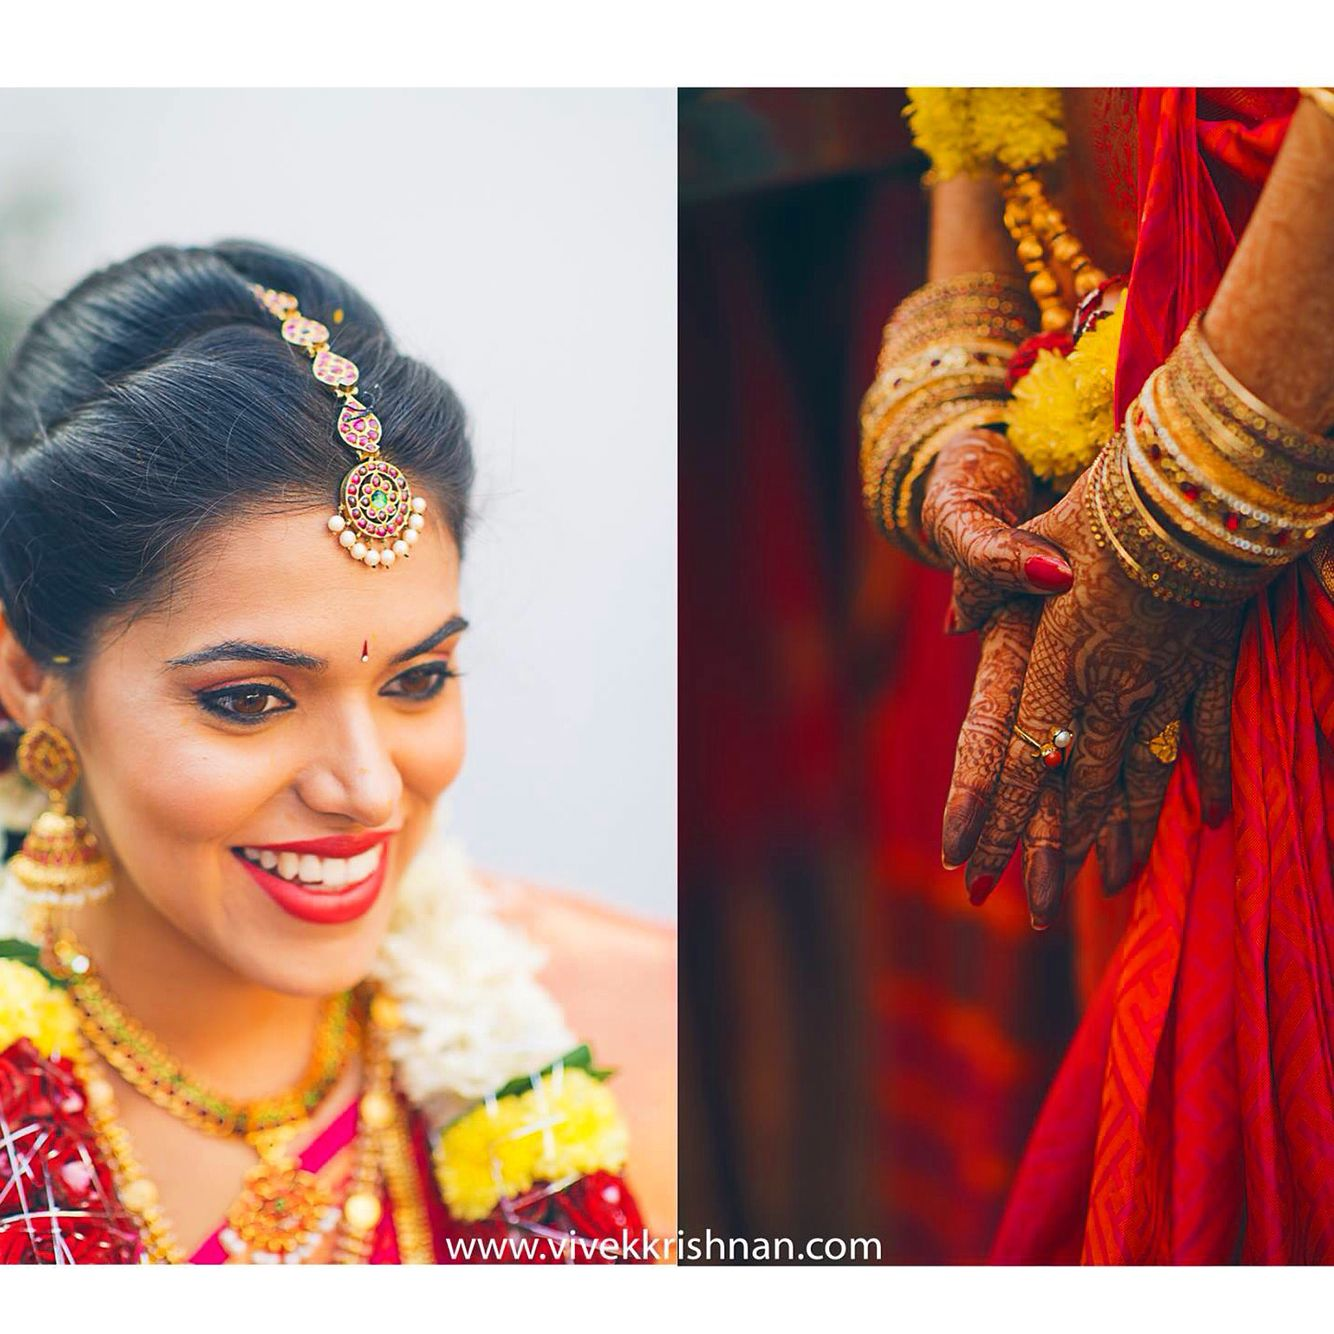 Brahmin Wedding In Hydrebad Beautiful Bride In Red Saree